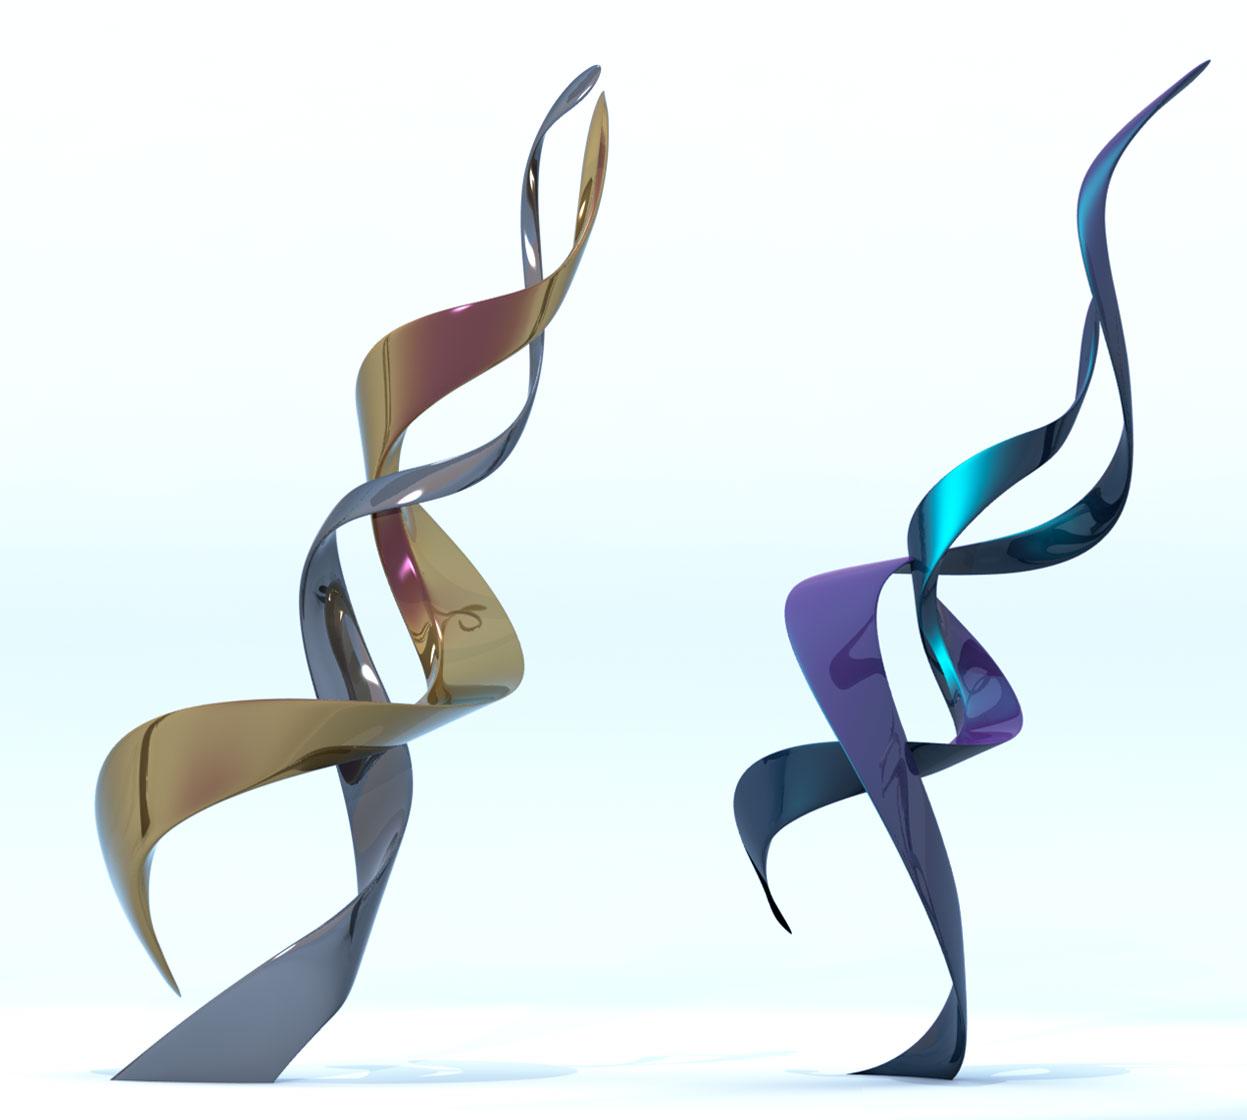 Unity Modern Sculpture - Contemporary Public Art